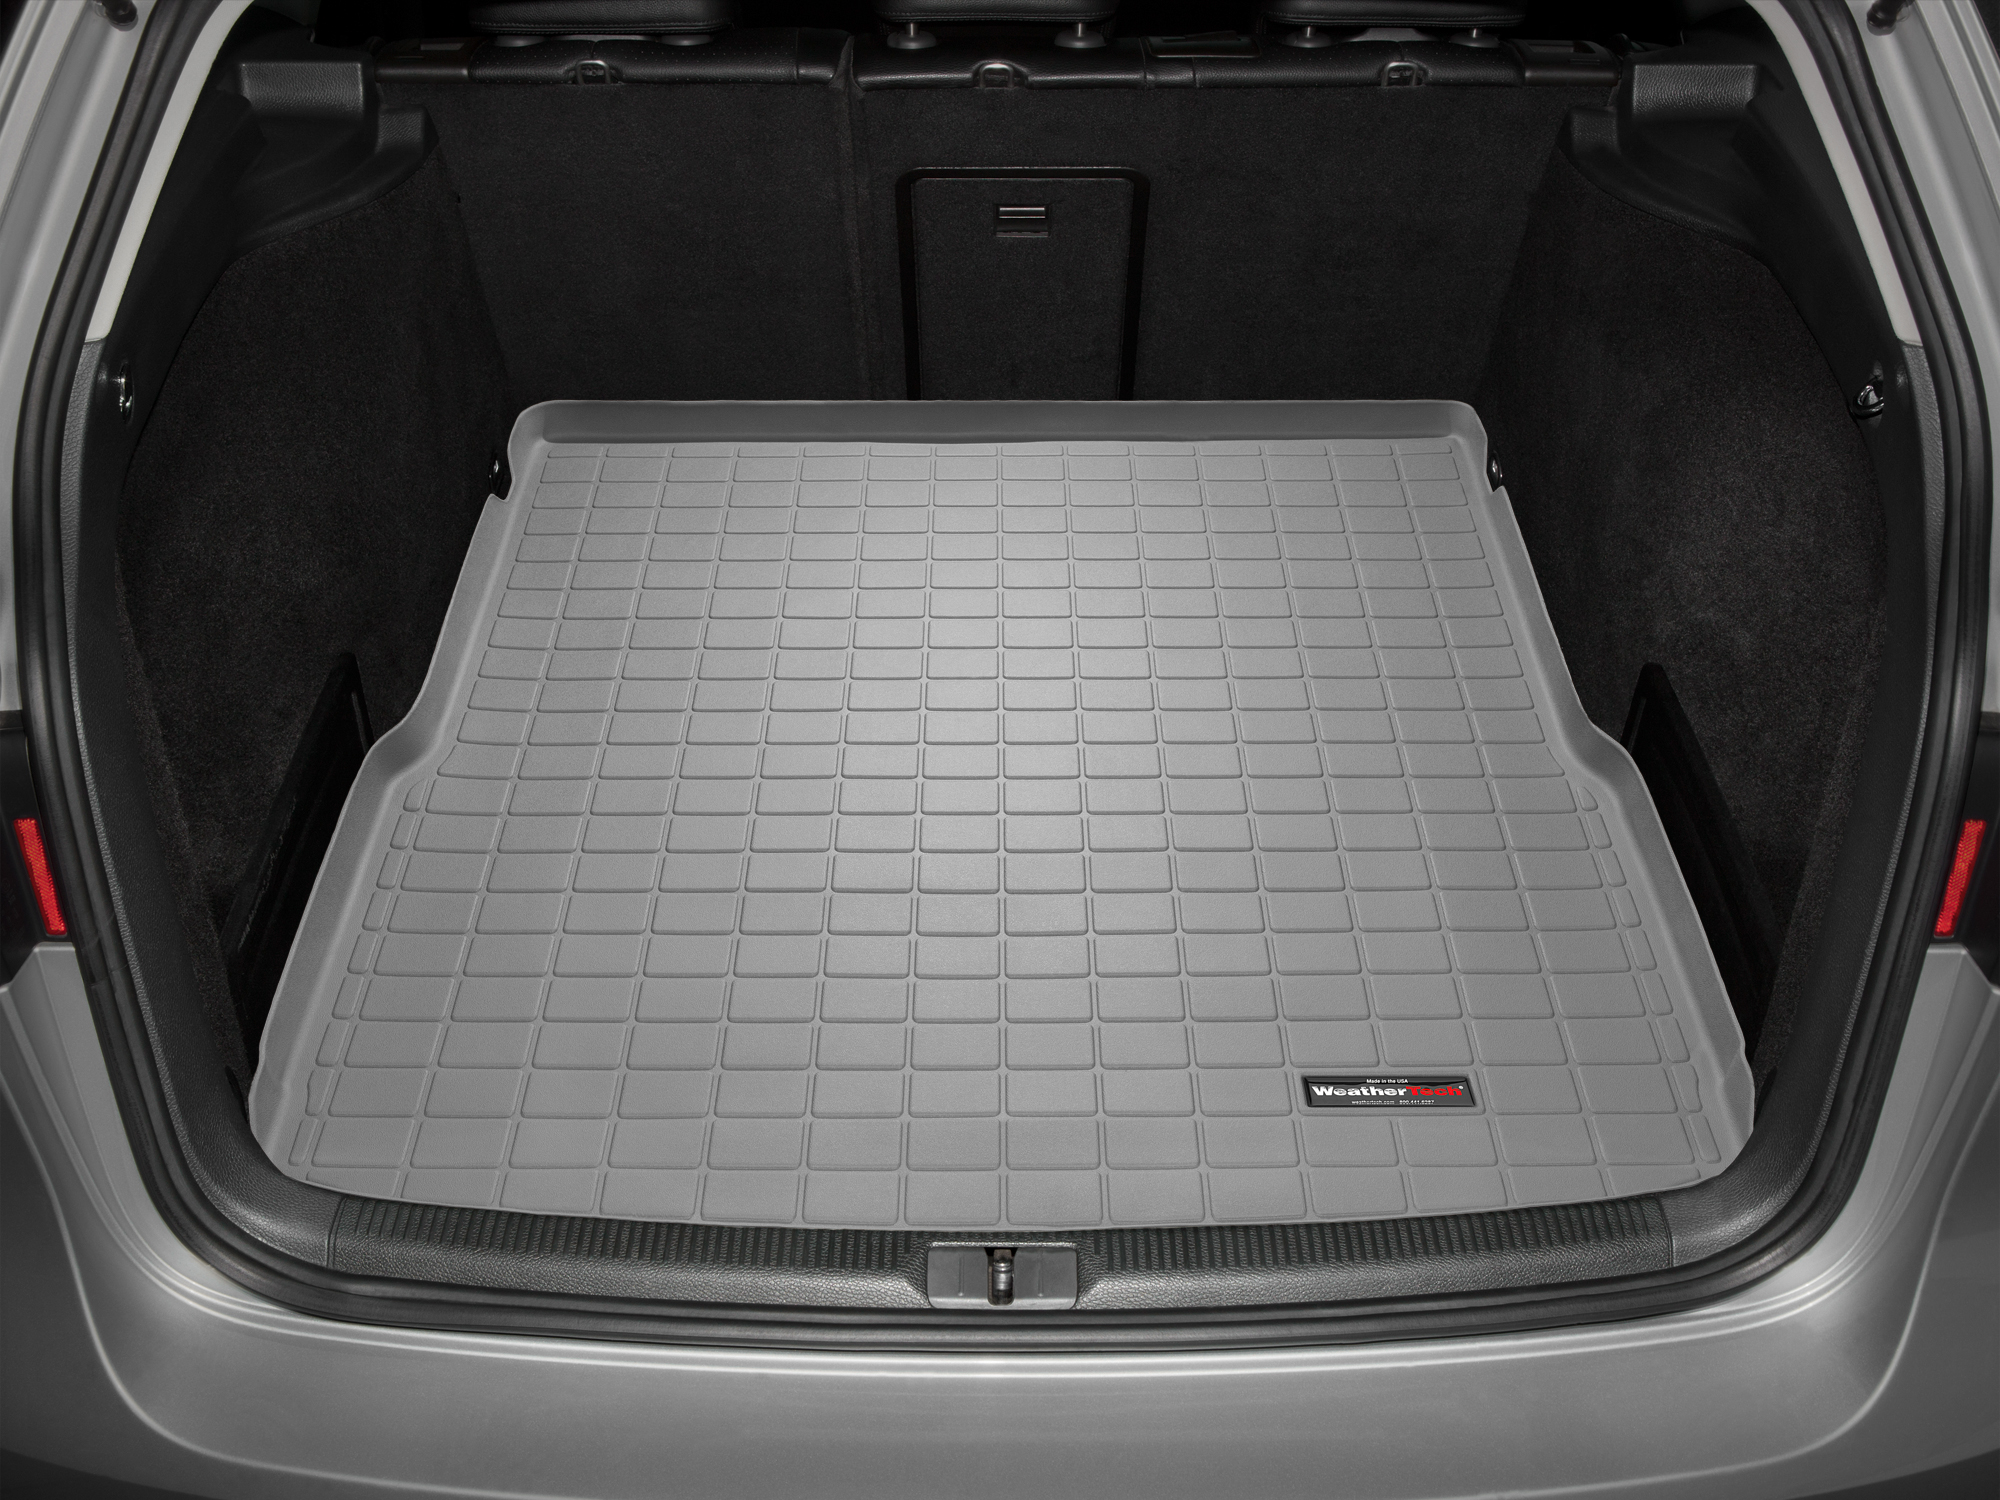 Volkswagen Passat 1997>2005 Vasca baule tappeto bagagliaio nero *1400